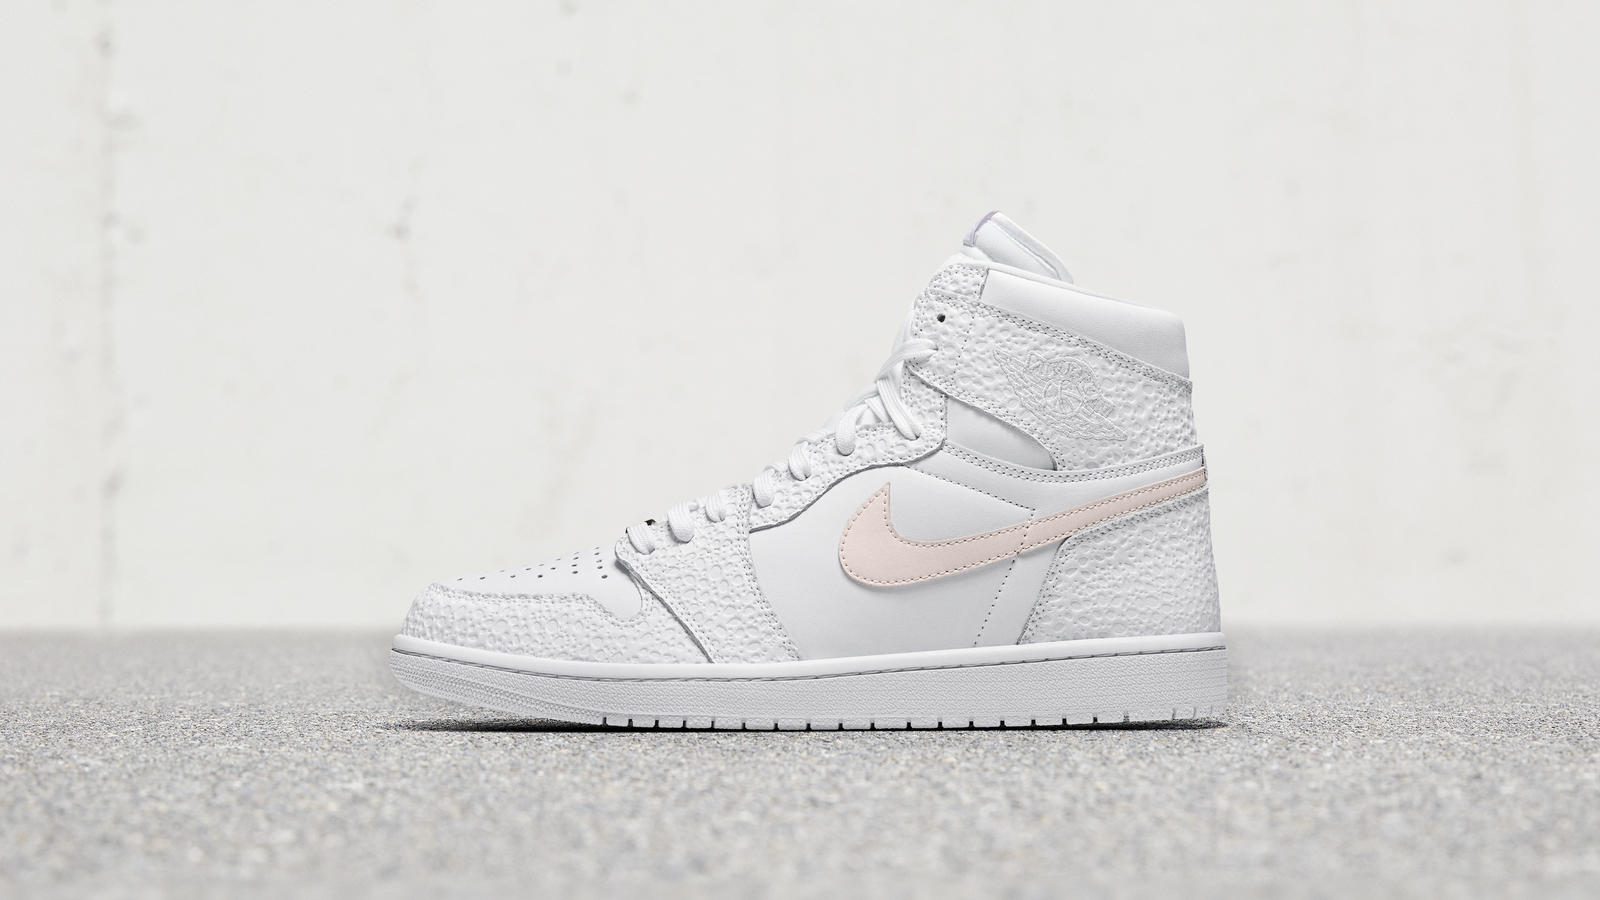 online store 539e1 93e12 Nike Flyleather Jordan 1 SE 0